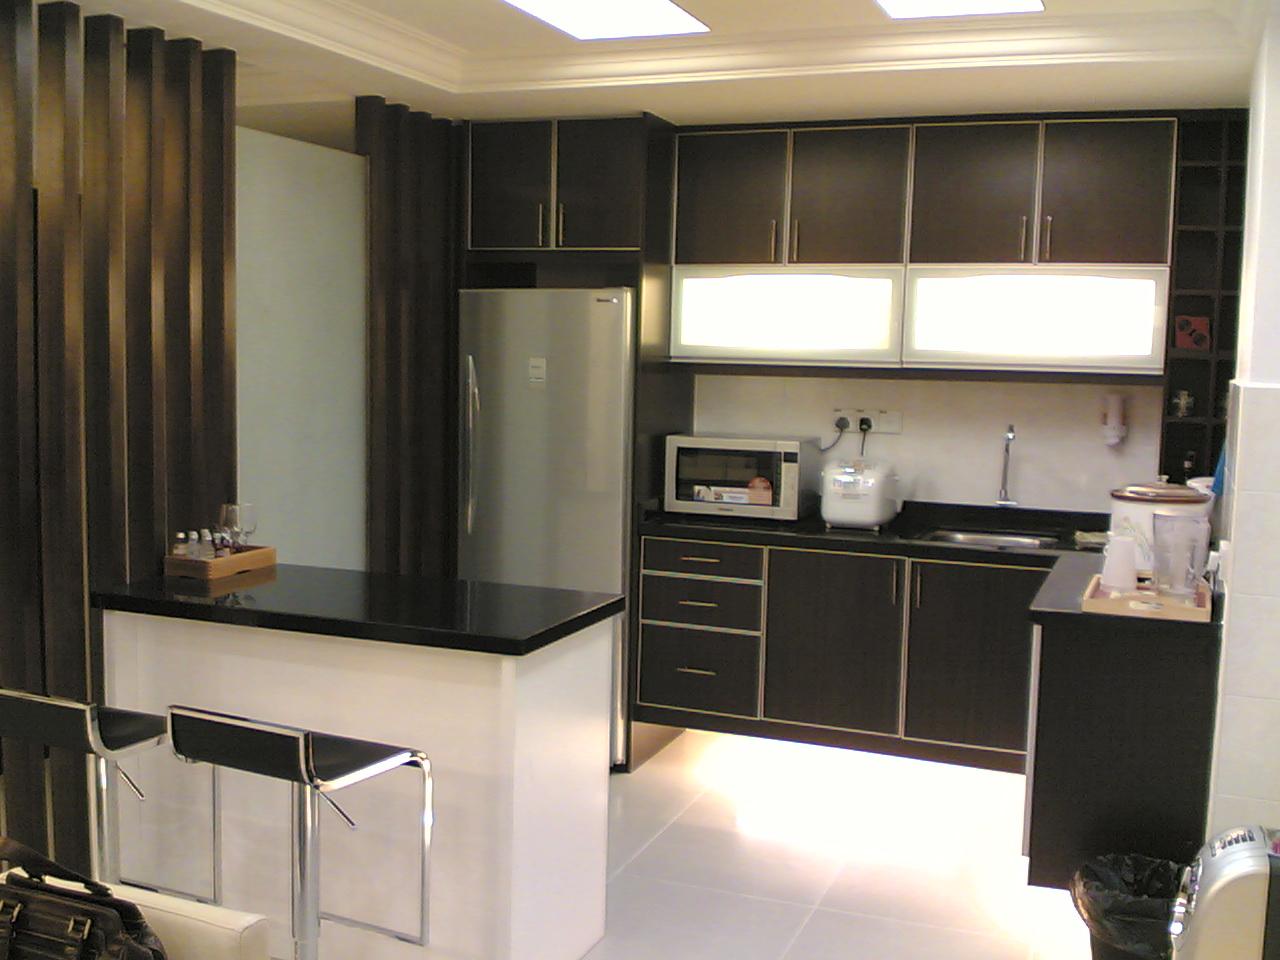 Glass top kitchen table set photo - 3